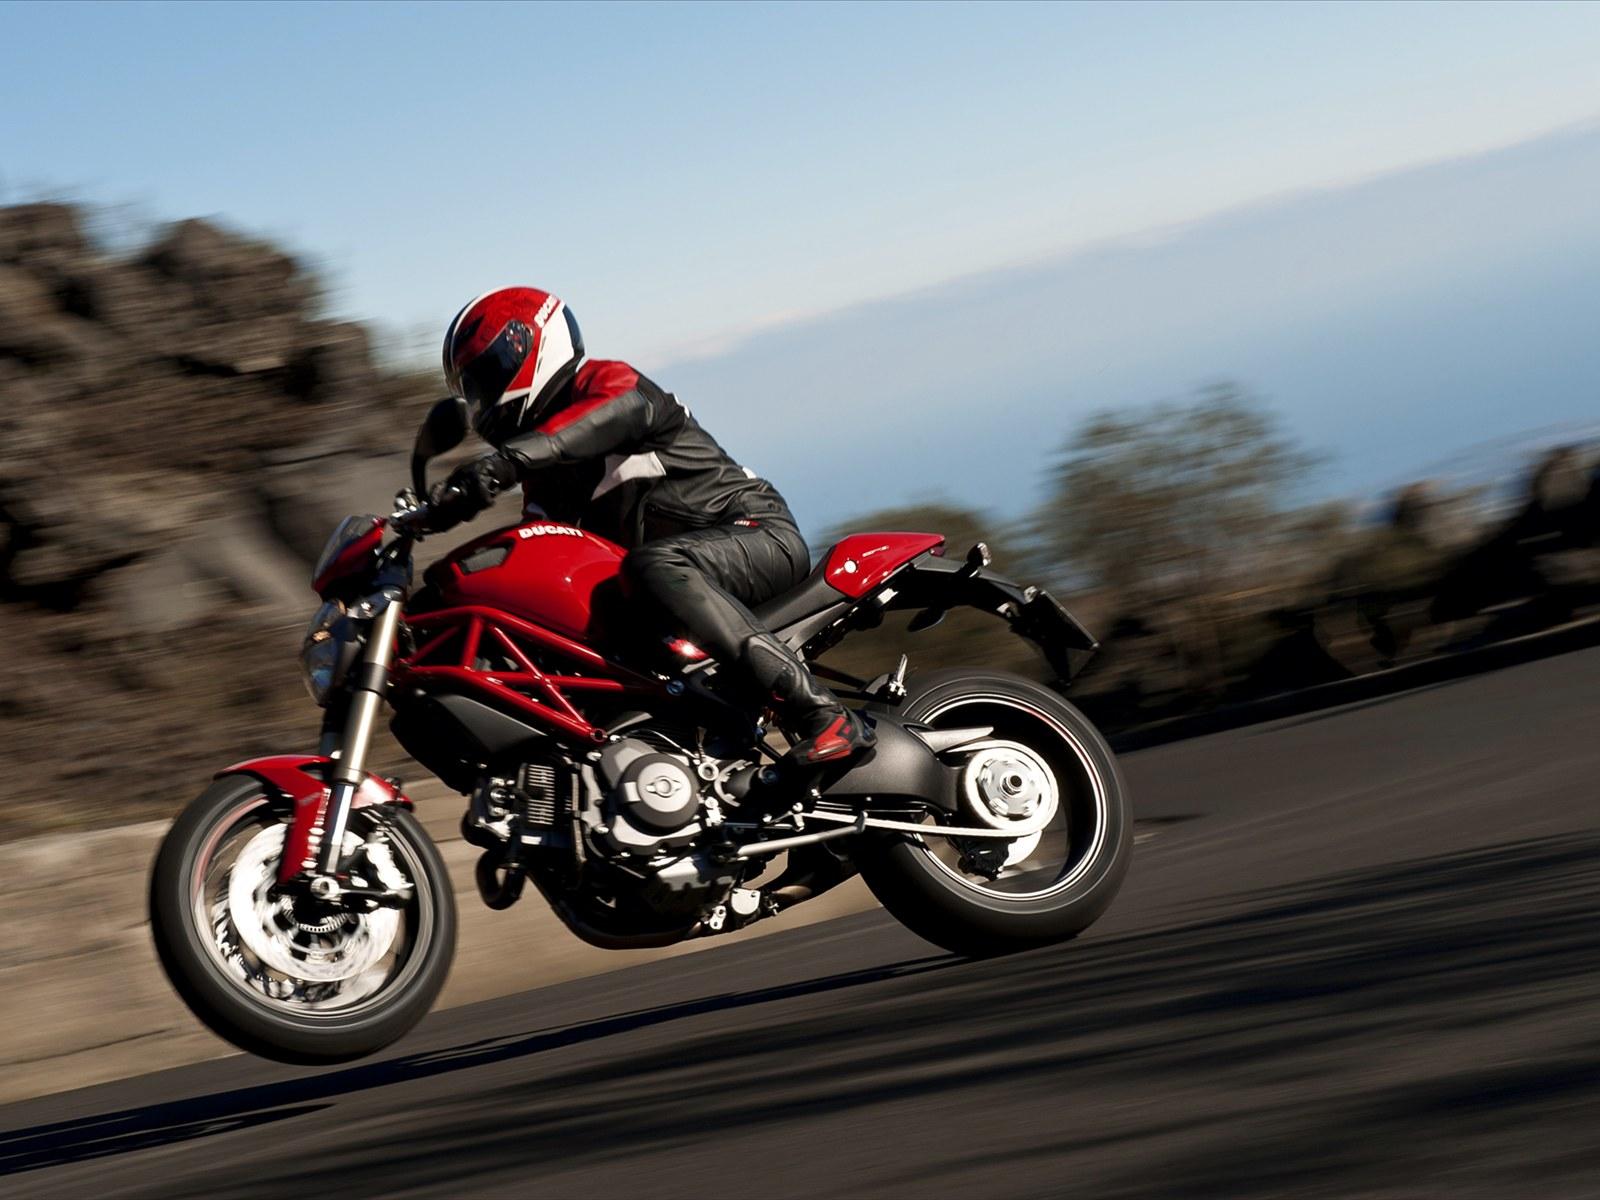 http://2.bp.blogspot.com/-RJ2sAPMMt9U/TeKG-XazB1I/AAAAAAAAAUo/lByWX1niYjw/s1600/2012-Ducati-Monster-1100-EVO-Pictures.jpg